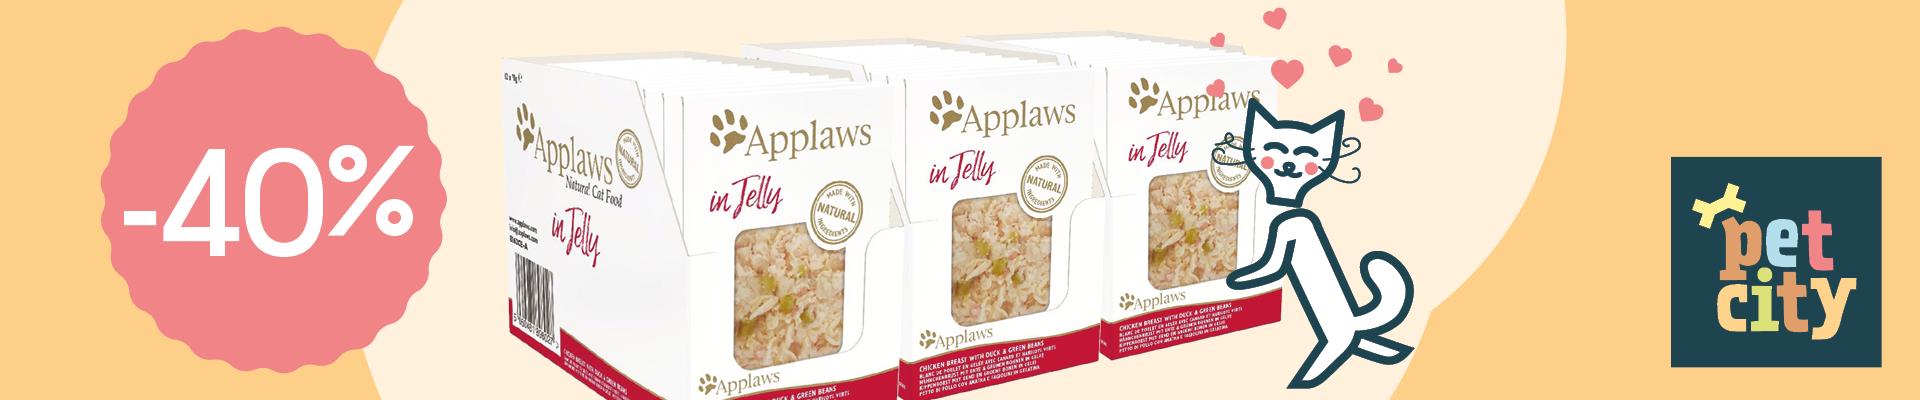 Applaws -40%